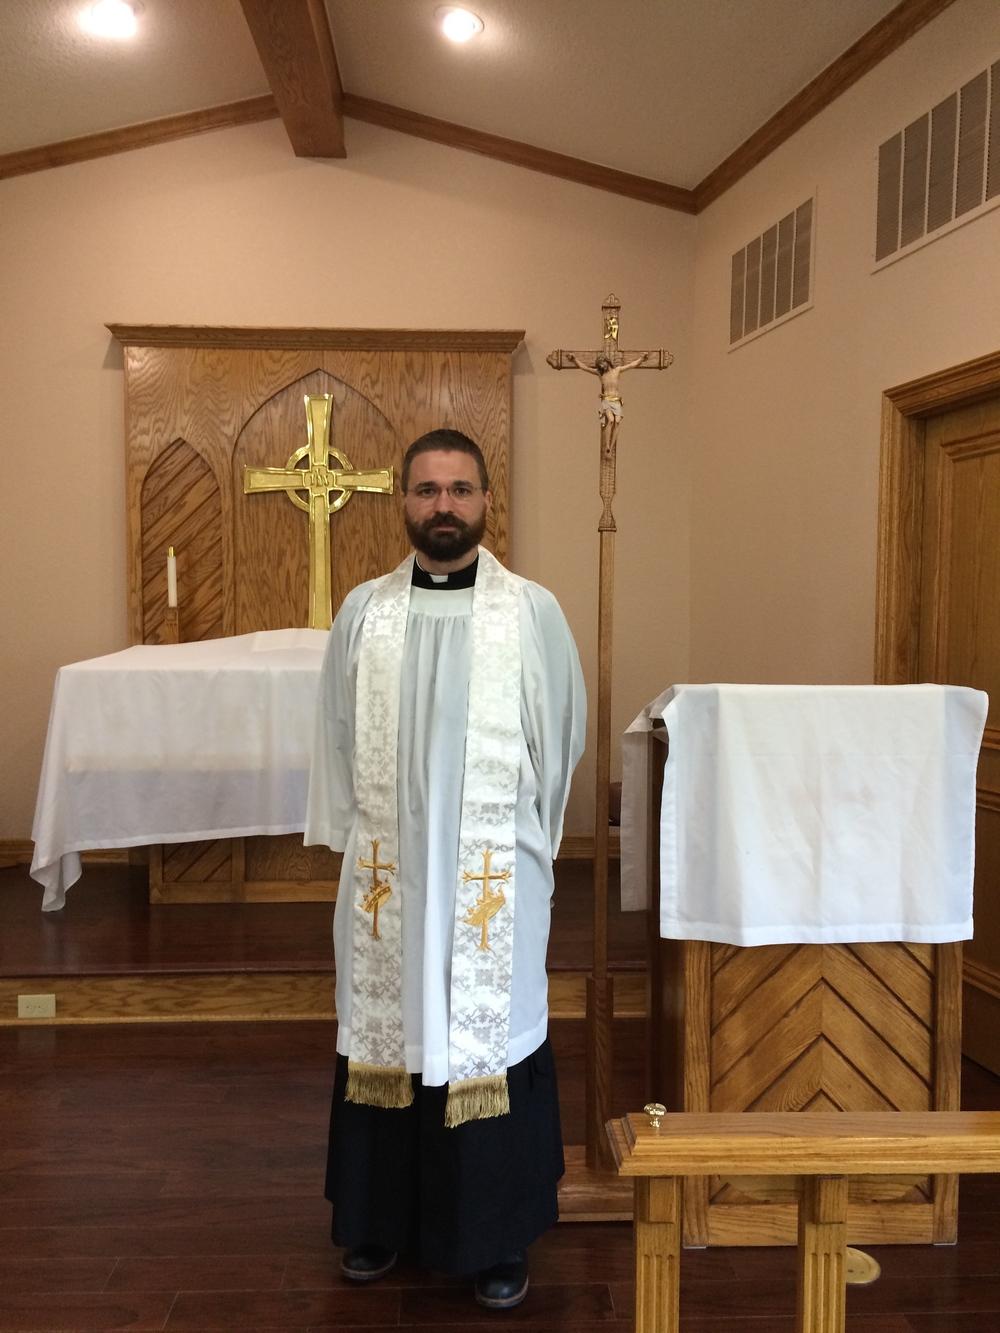 At Immanuel Lutheran Church